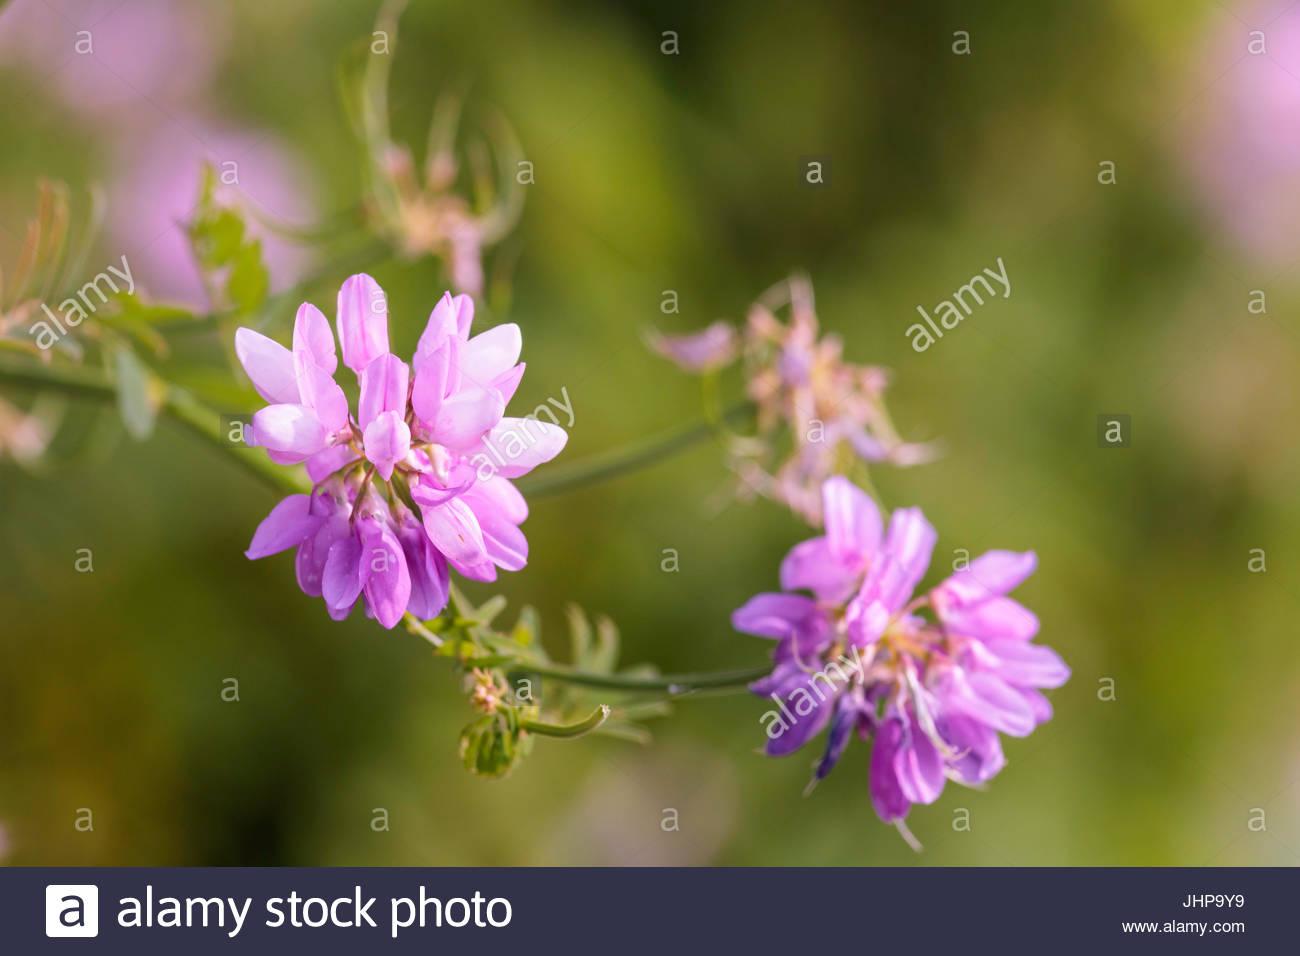 Purple flower crown stock photos purple flower crown stock images securigera varia coronilla varia crownvetch crown vetch axseed purple crown vetch ground cover flower wildflower izmirmasajfo